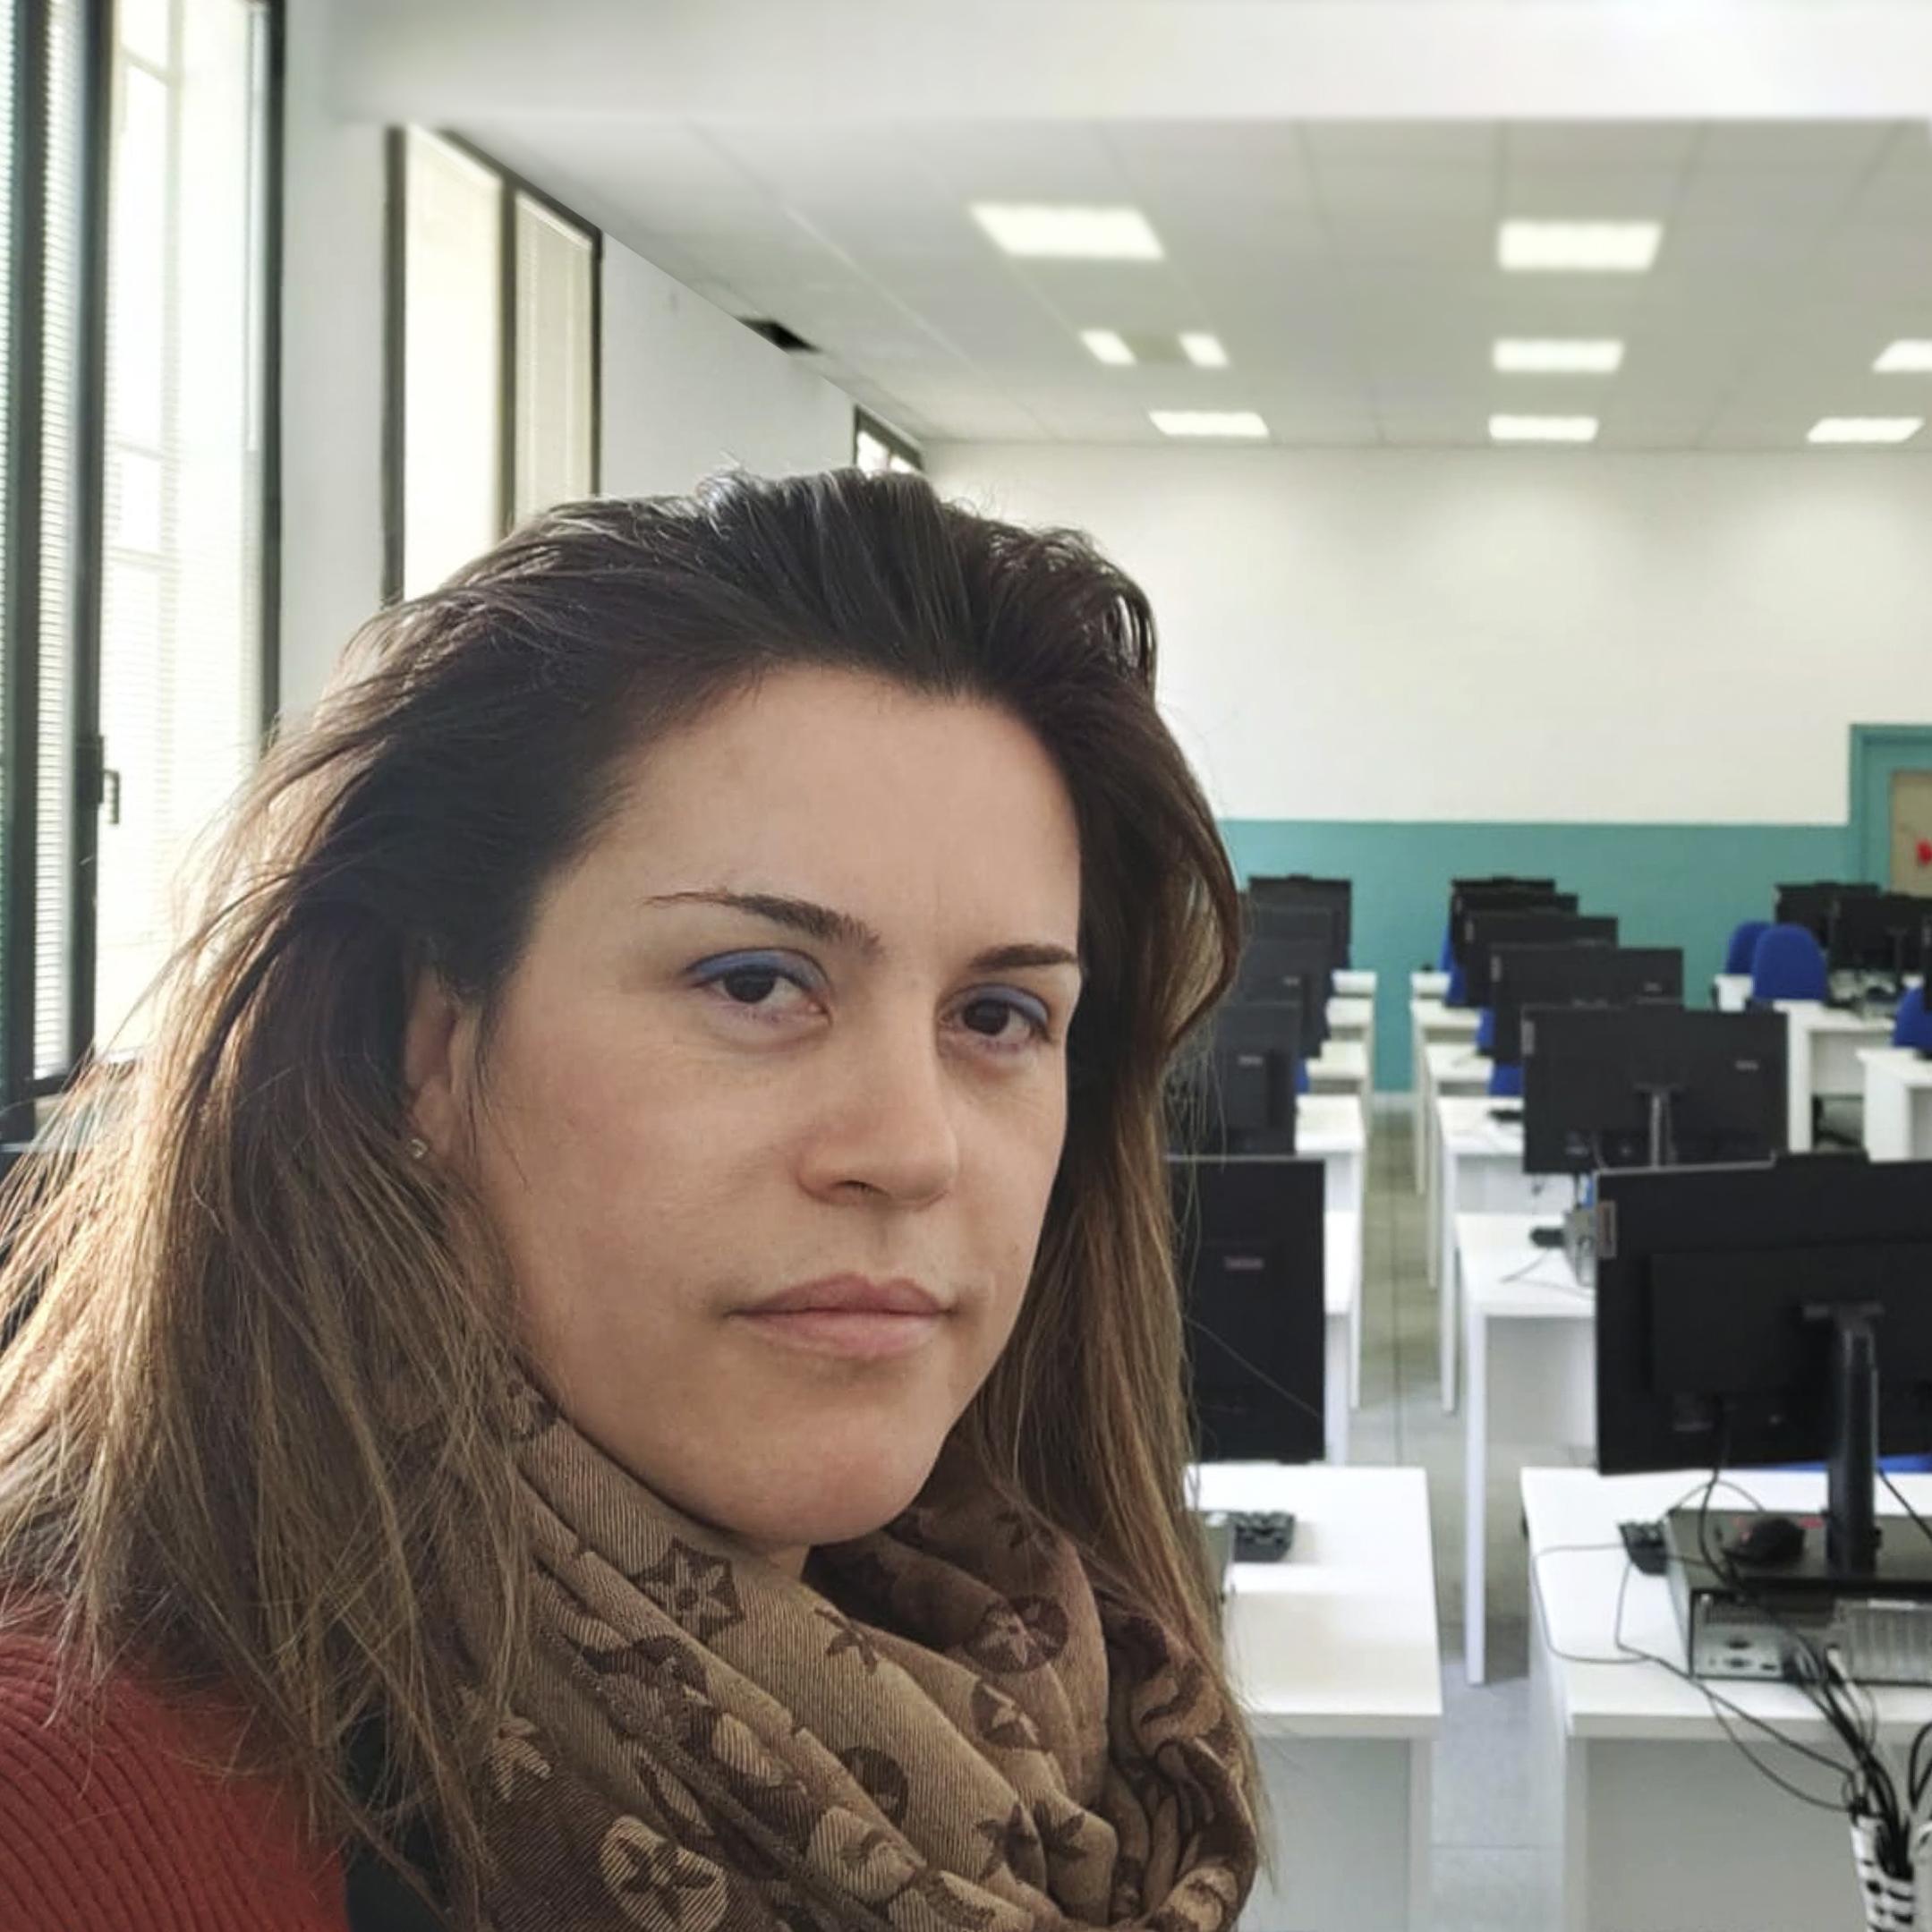 YOUforSMI_Tiziana Sardignolo